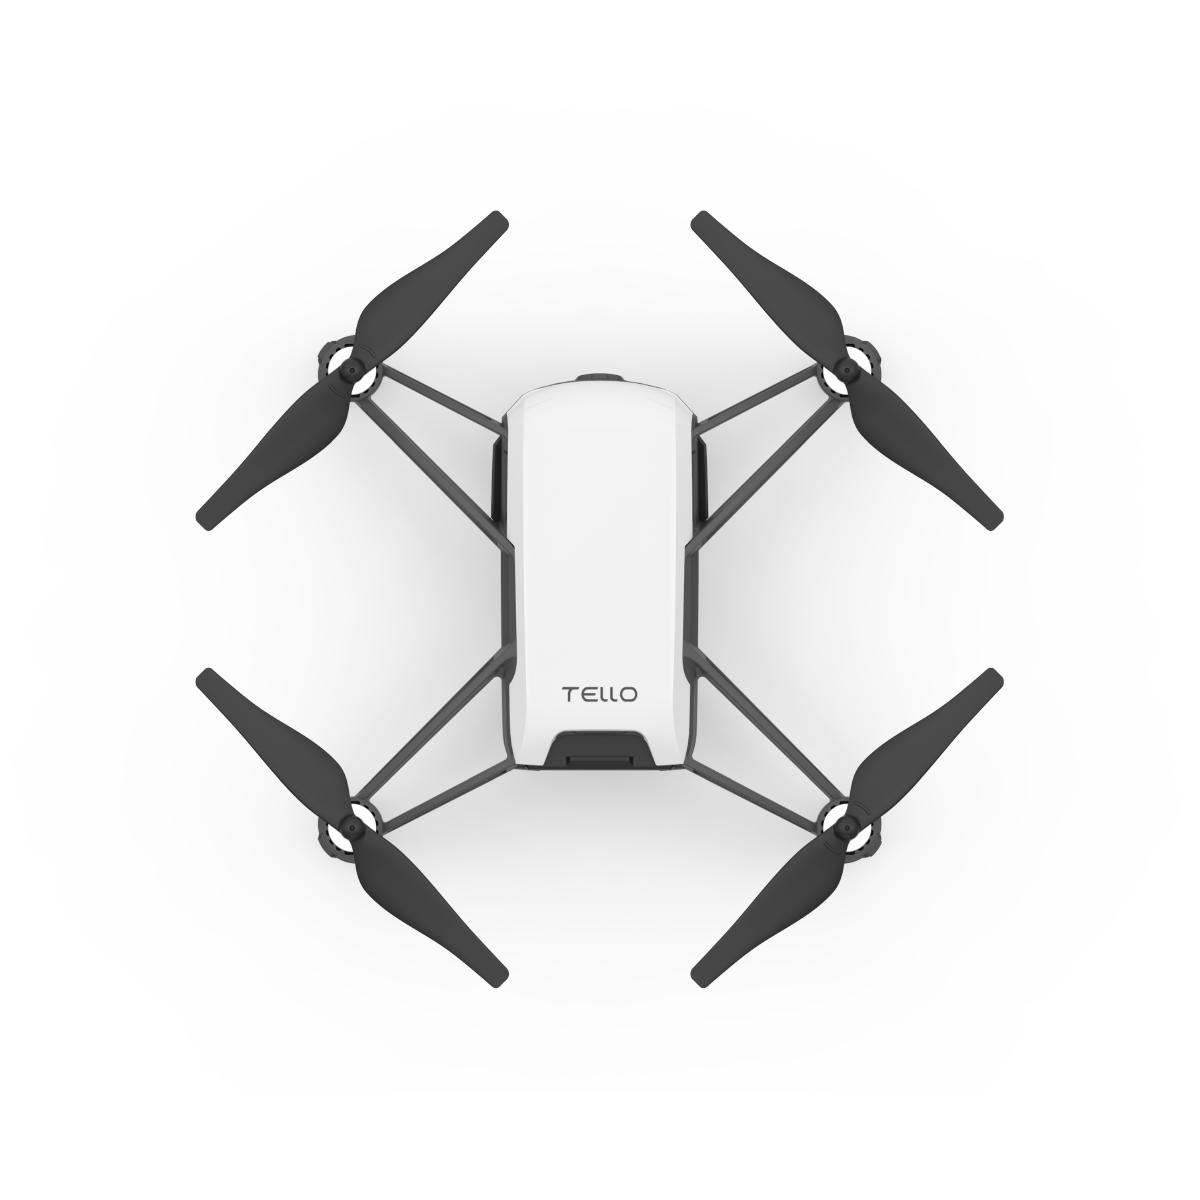 Hélice Quick-release Propellers Original DJI para Drone Tello